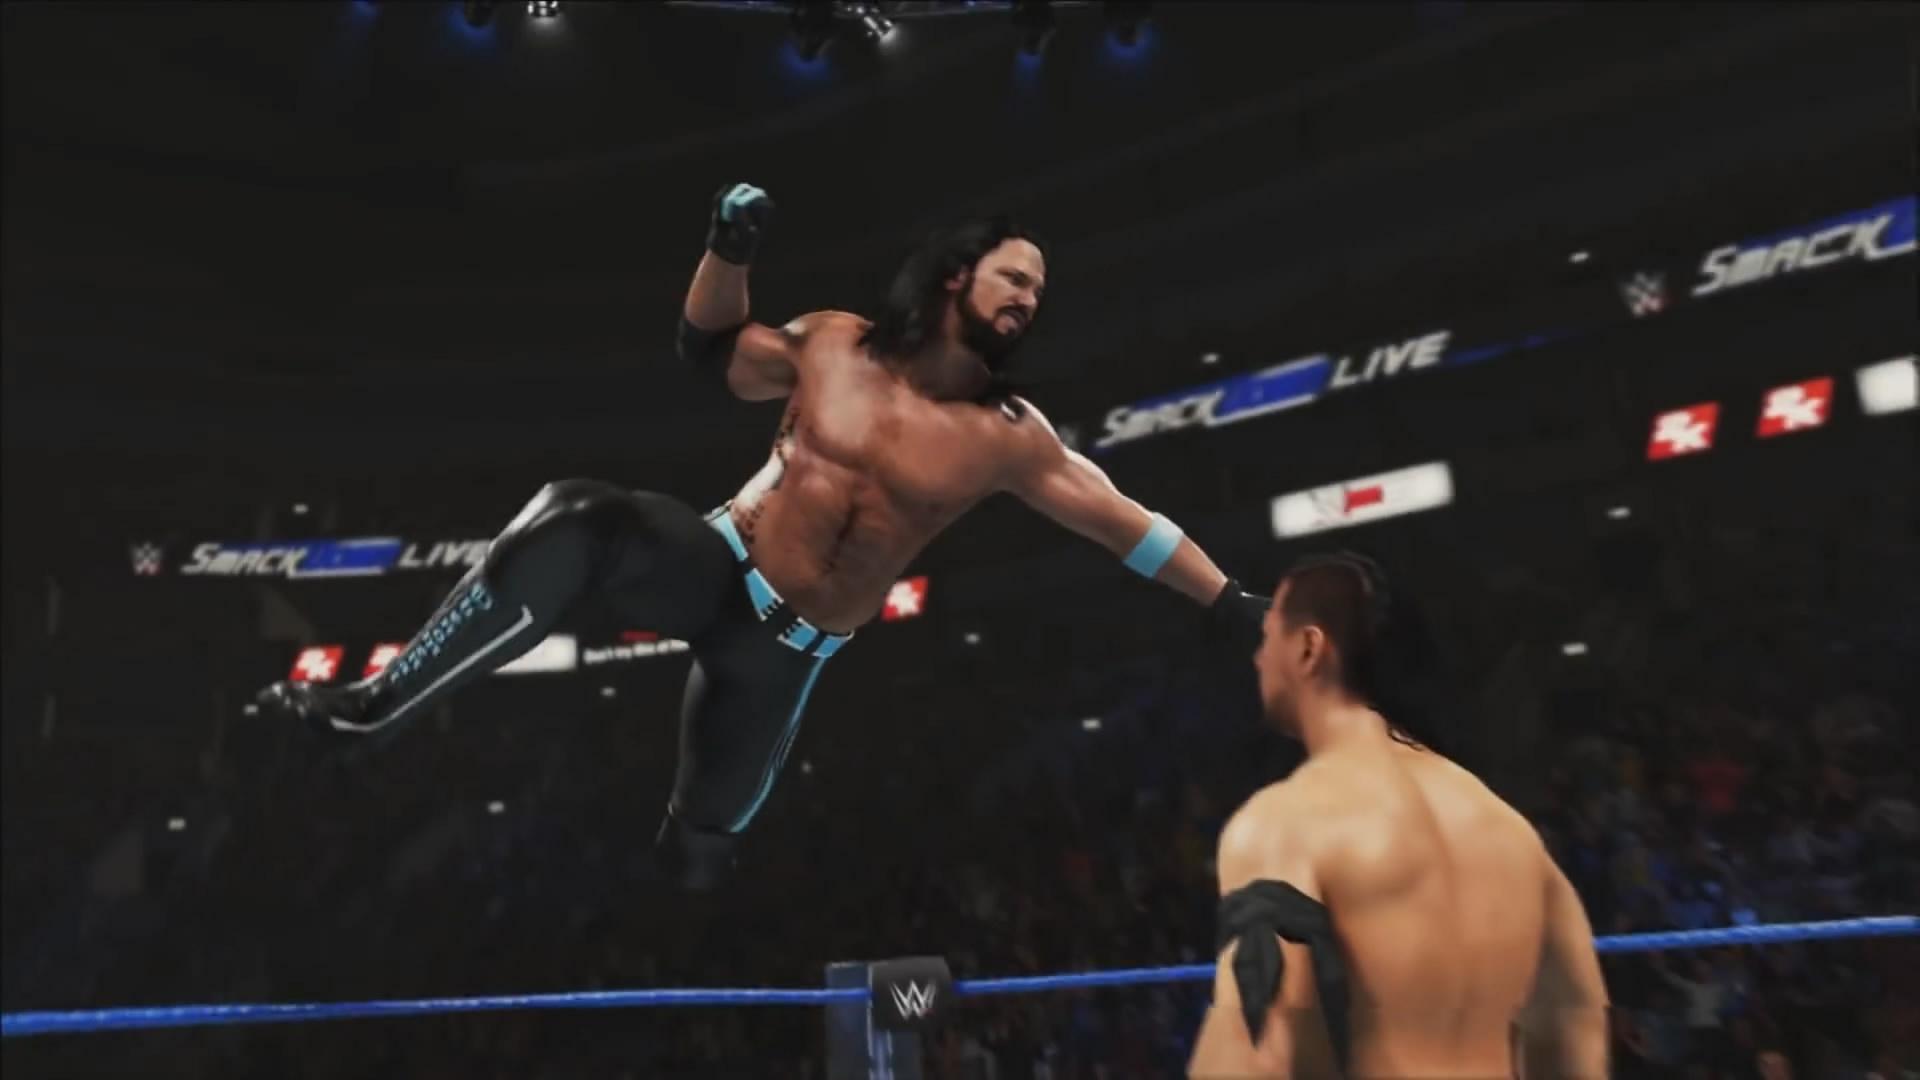 《WWE 2K19》新预告片 超级巨星激情摔跤爽个不停